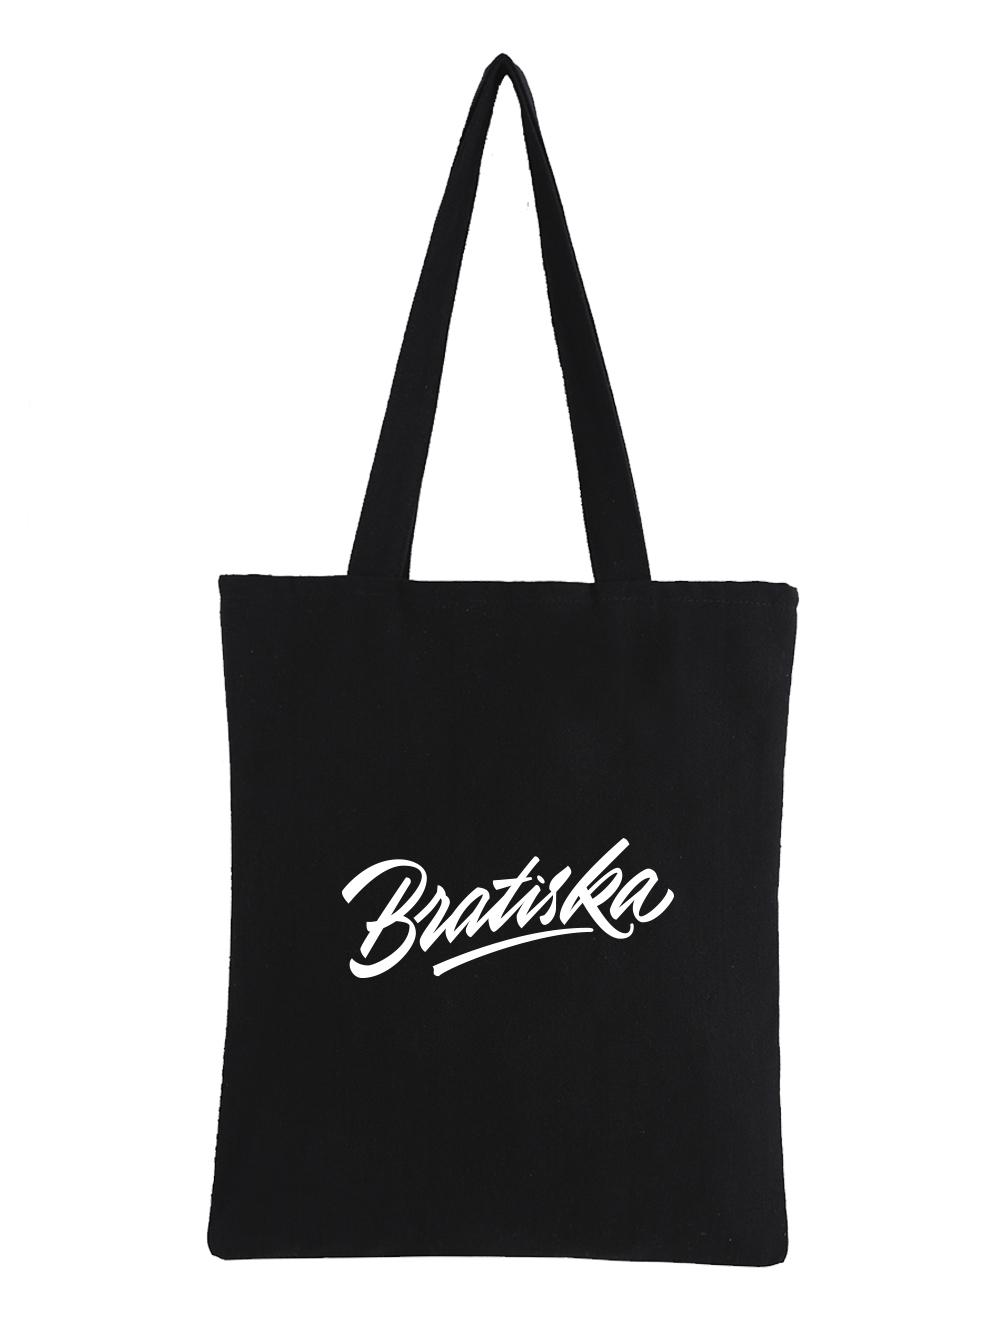 Bratiska Brush